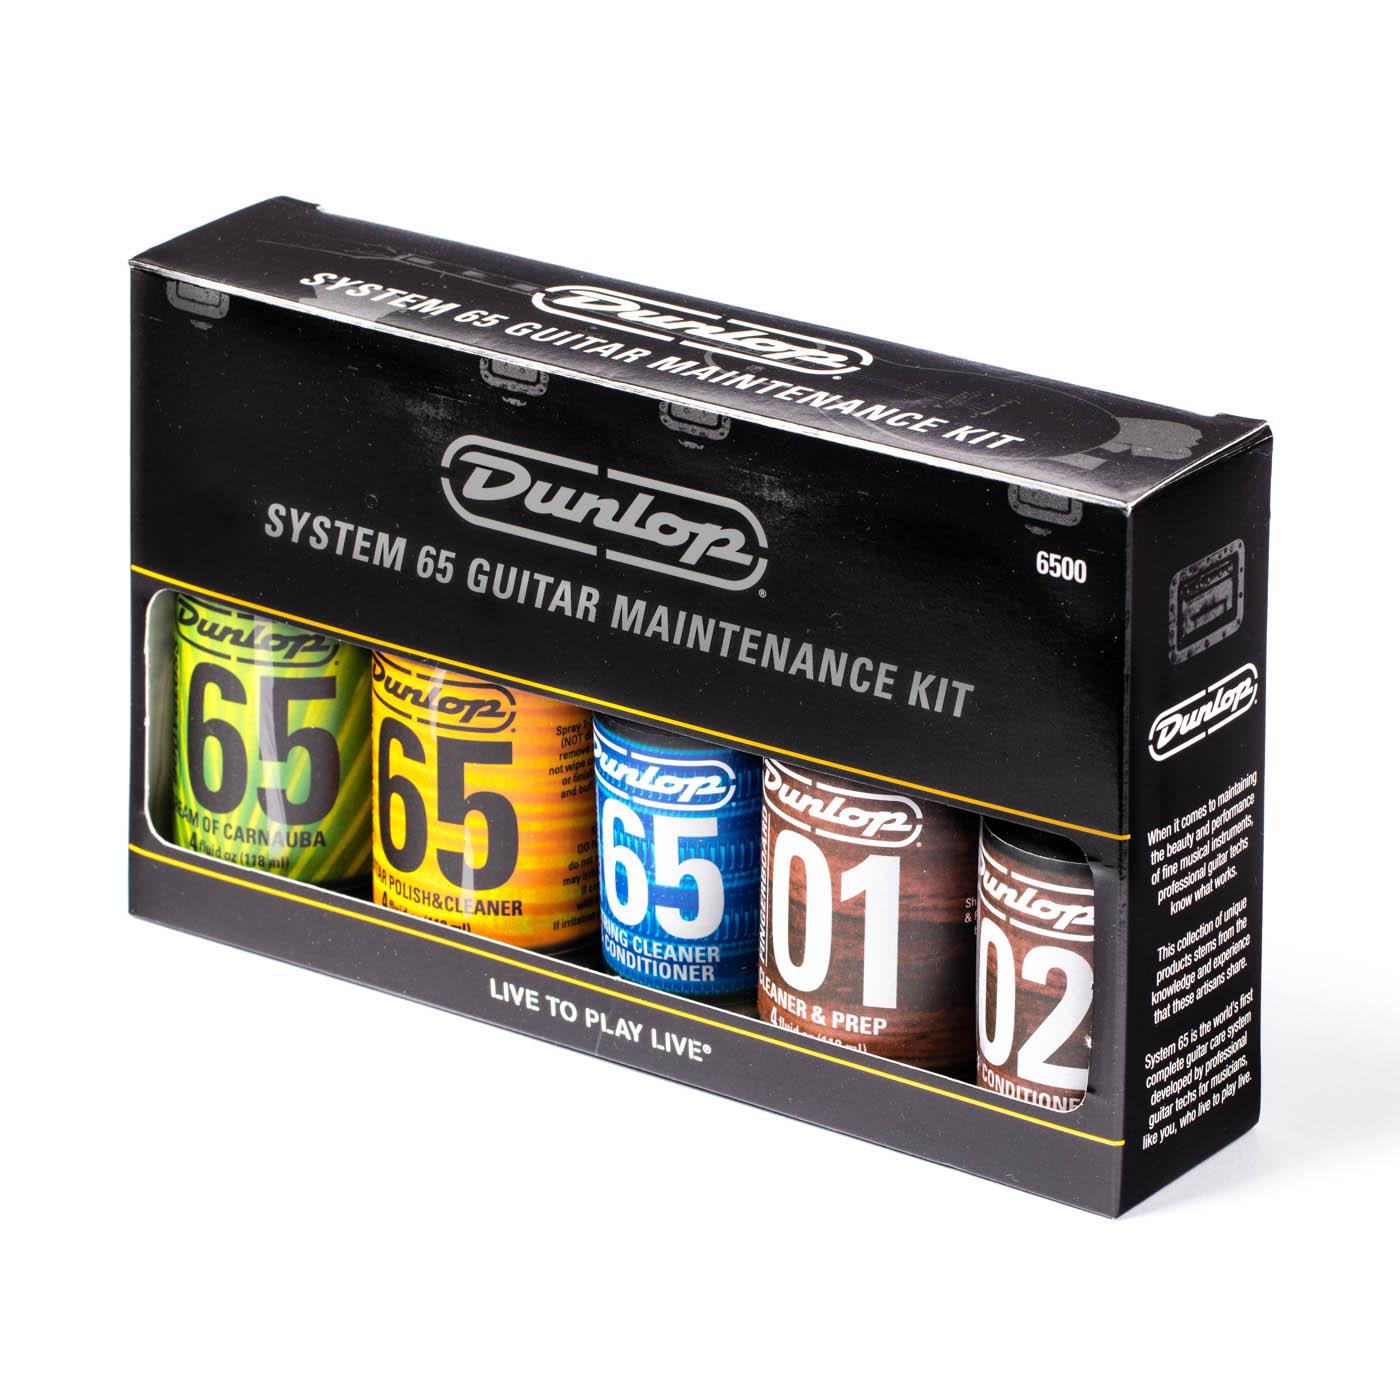 Dunlop Guitar Maintenance Kit 6500